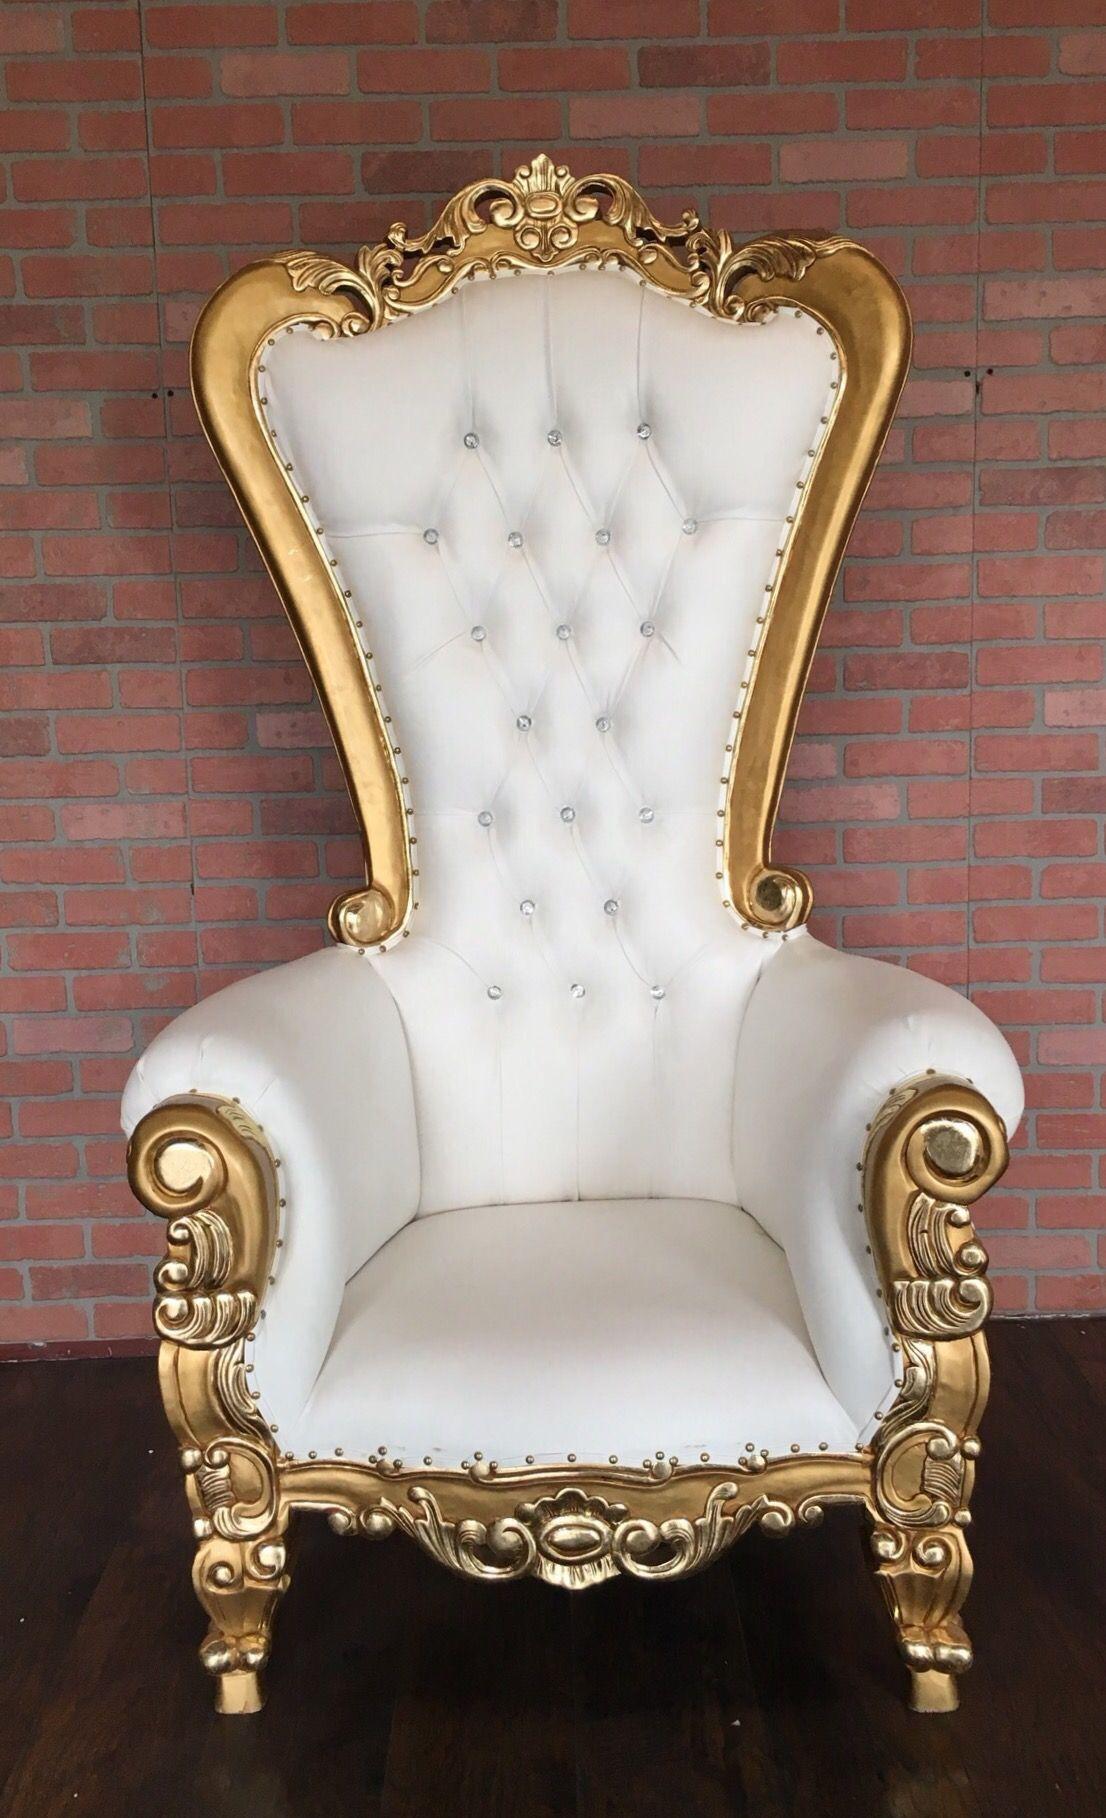 Luxurious Seating